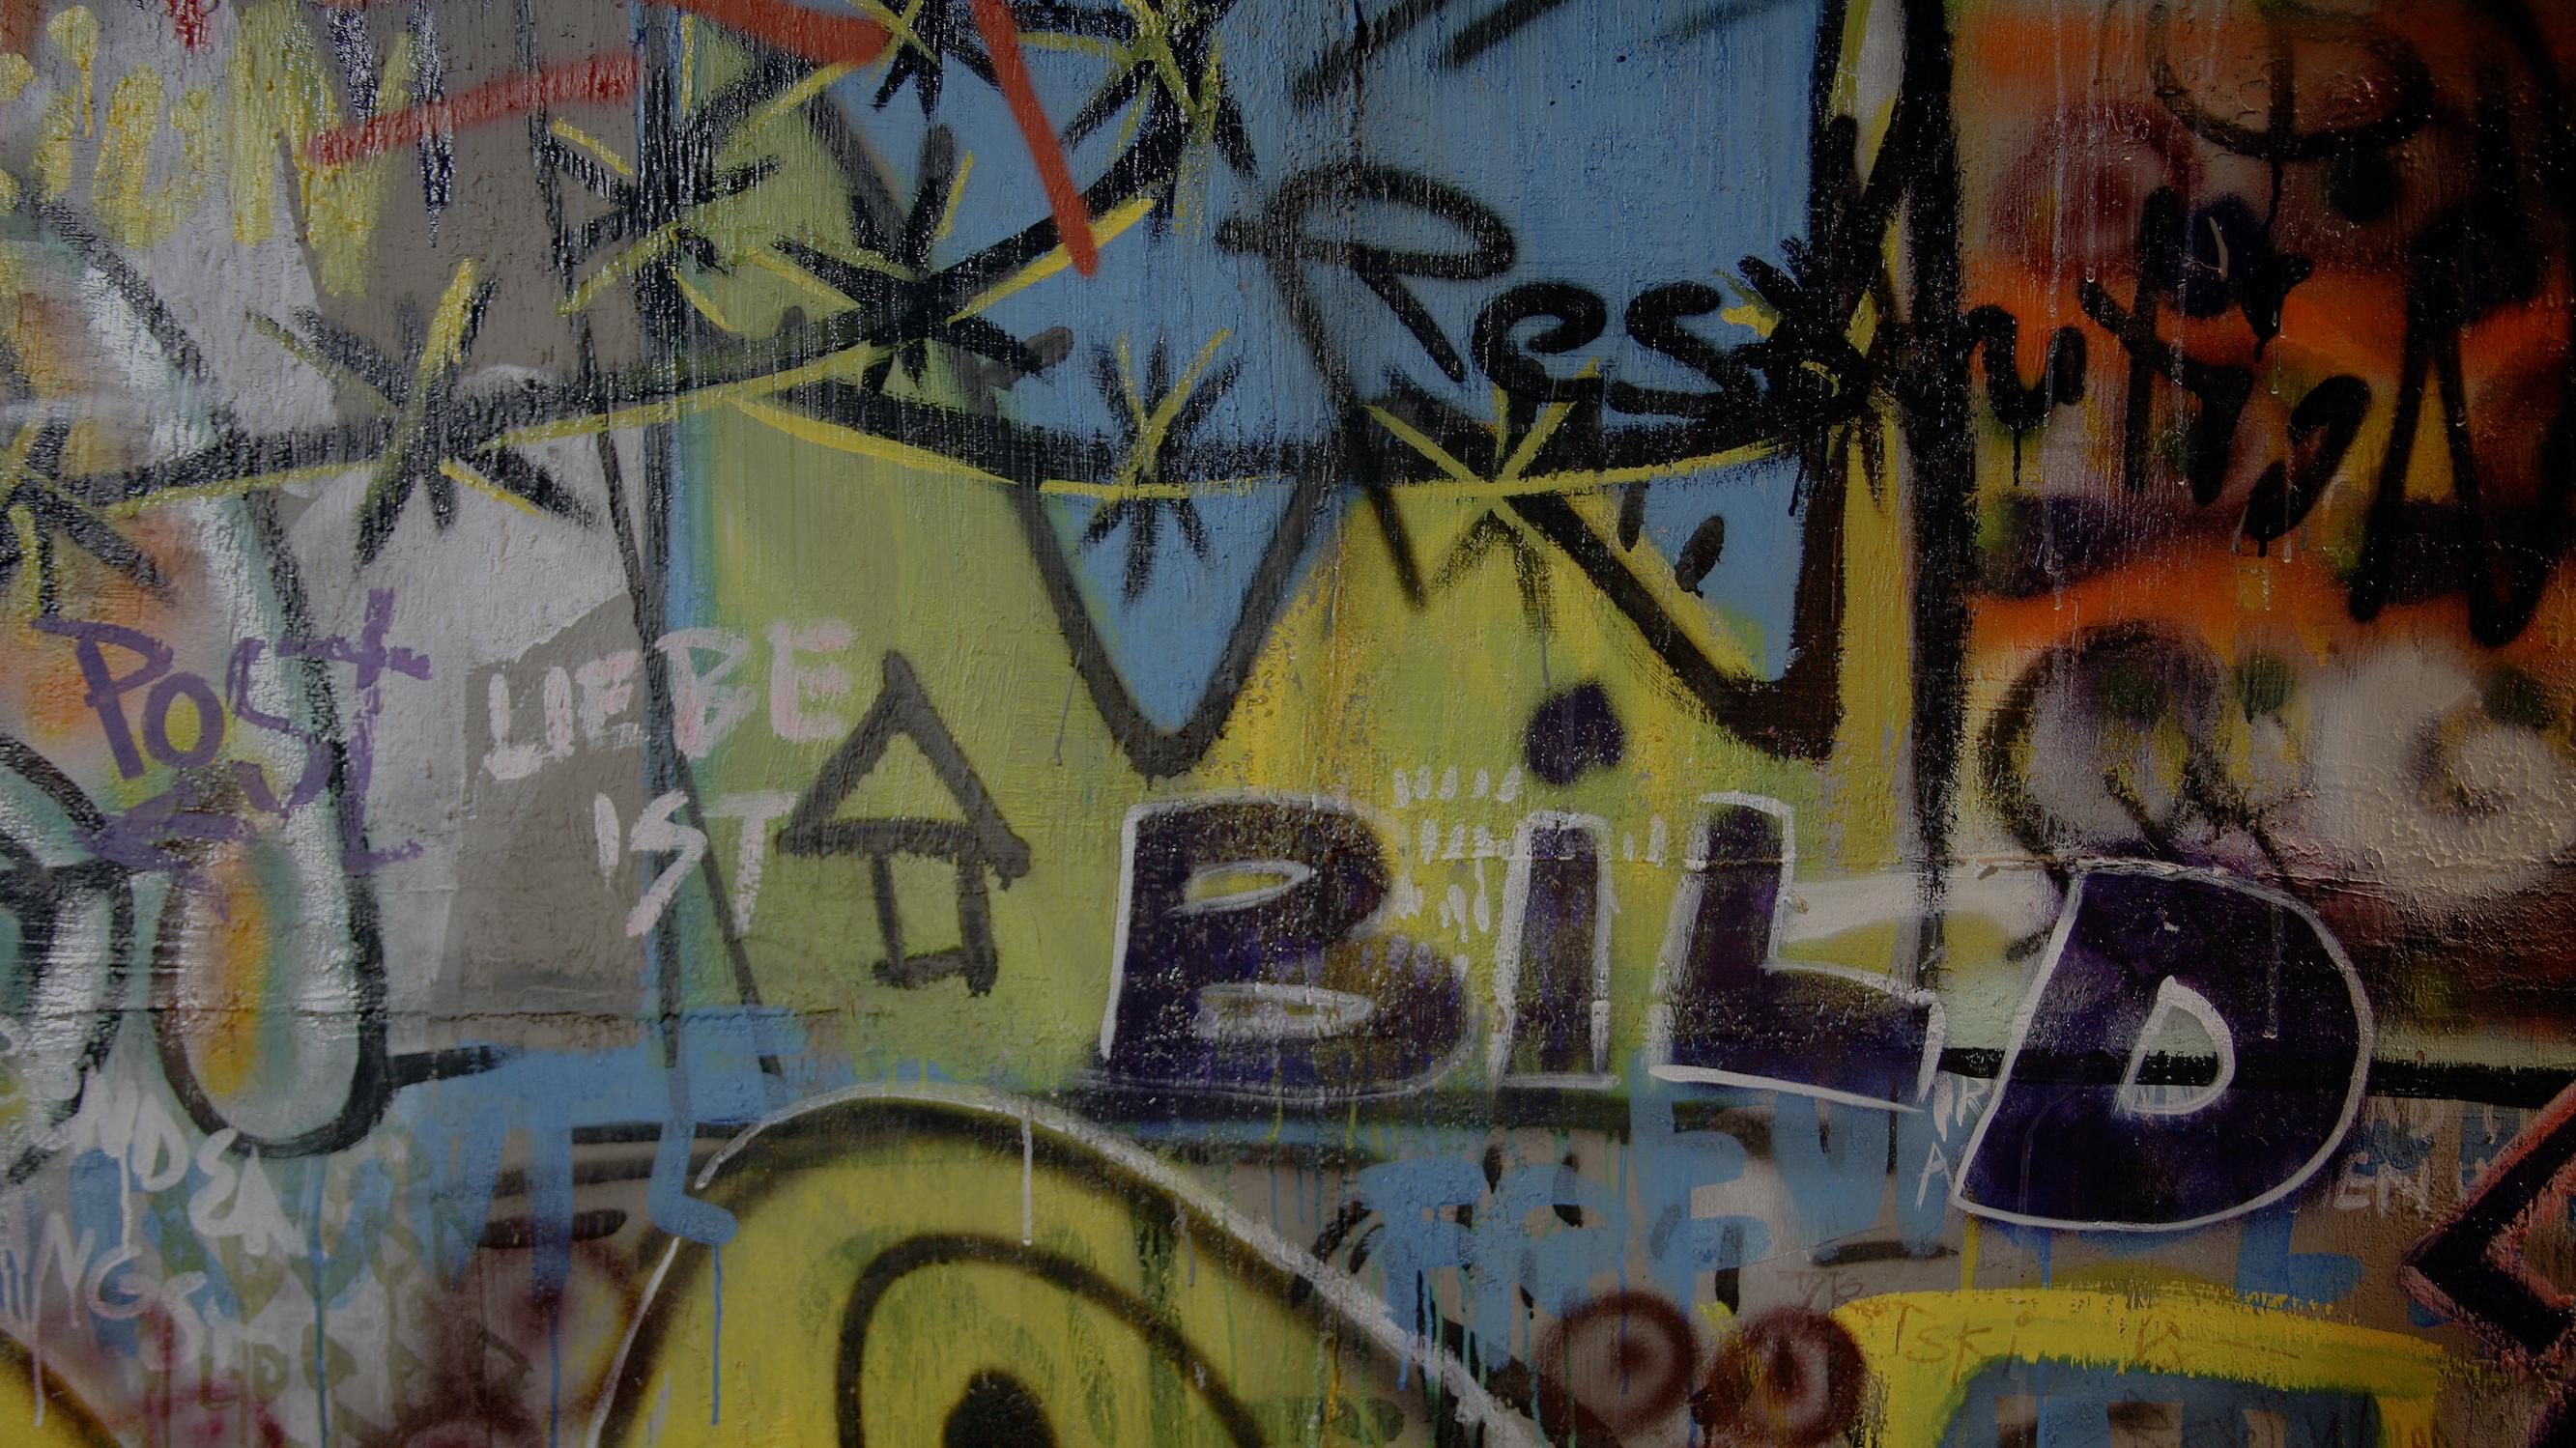 berlin street art an urban playground g adventures. Black Bedroom Furniture Sets. Home Design Ideas